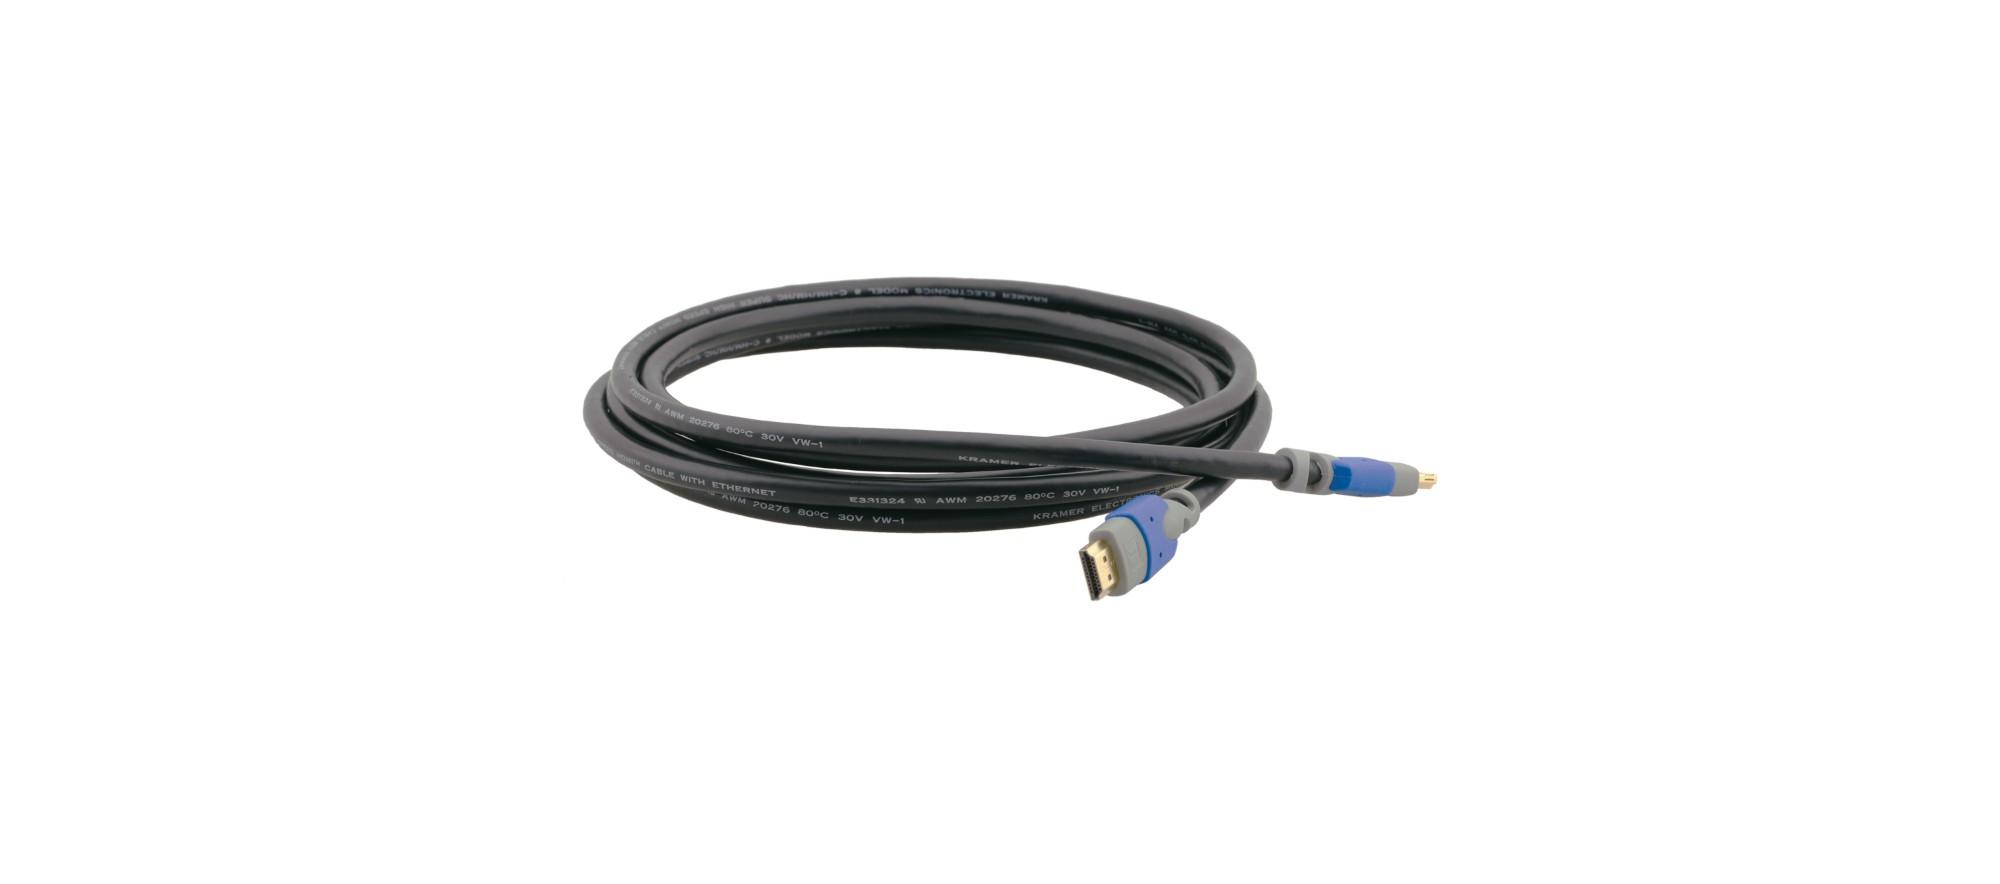 Kramer Electronics C-HM/HM/PRO-6 cable HDMI 1,8 m HDMI tipo A (Estándar) Negro